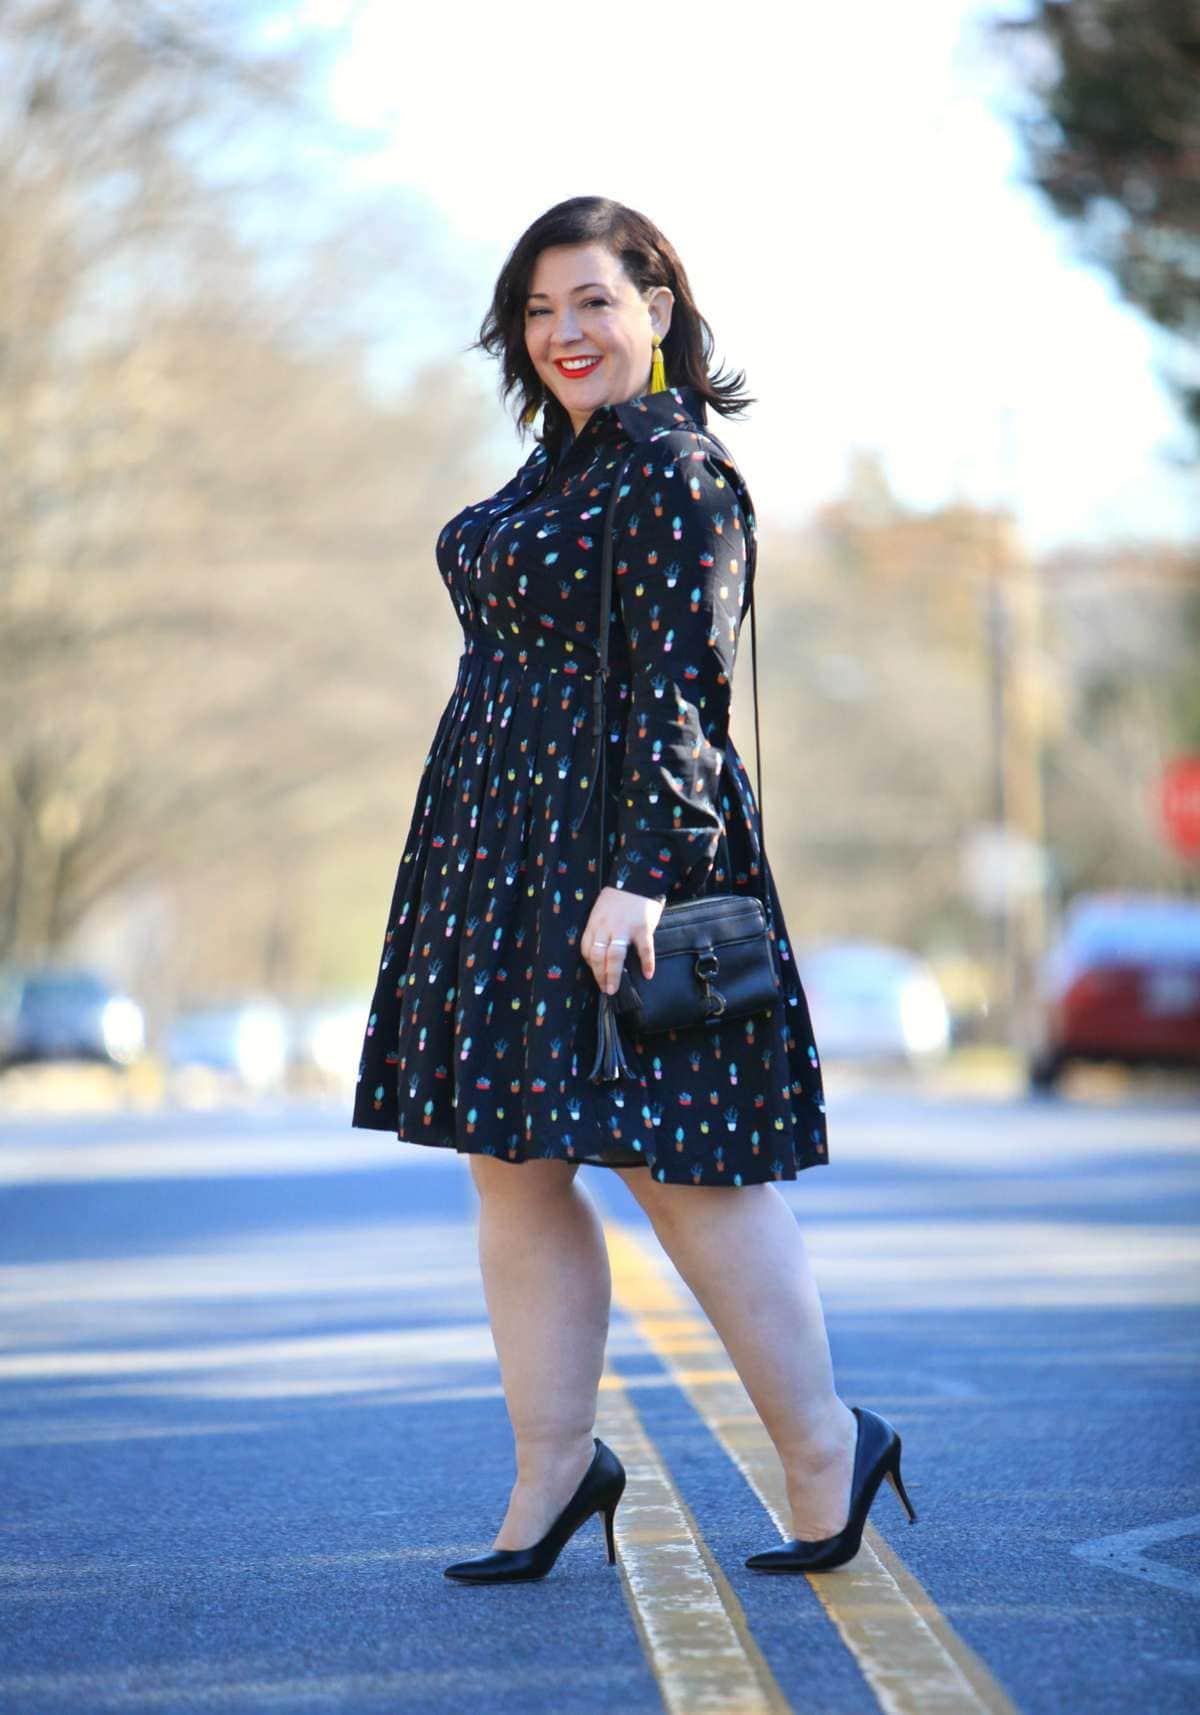 Wardrobe Oxygen in an Eloquii Conversational Dress, Rebecca Minkoff bag, and Baublebar tassel earrings